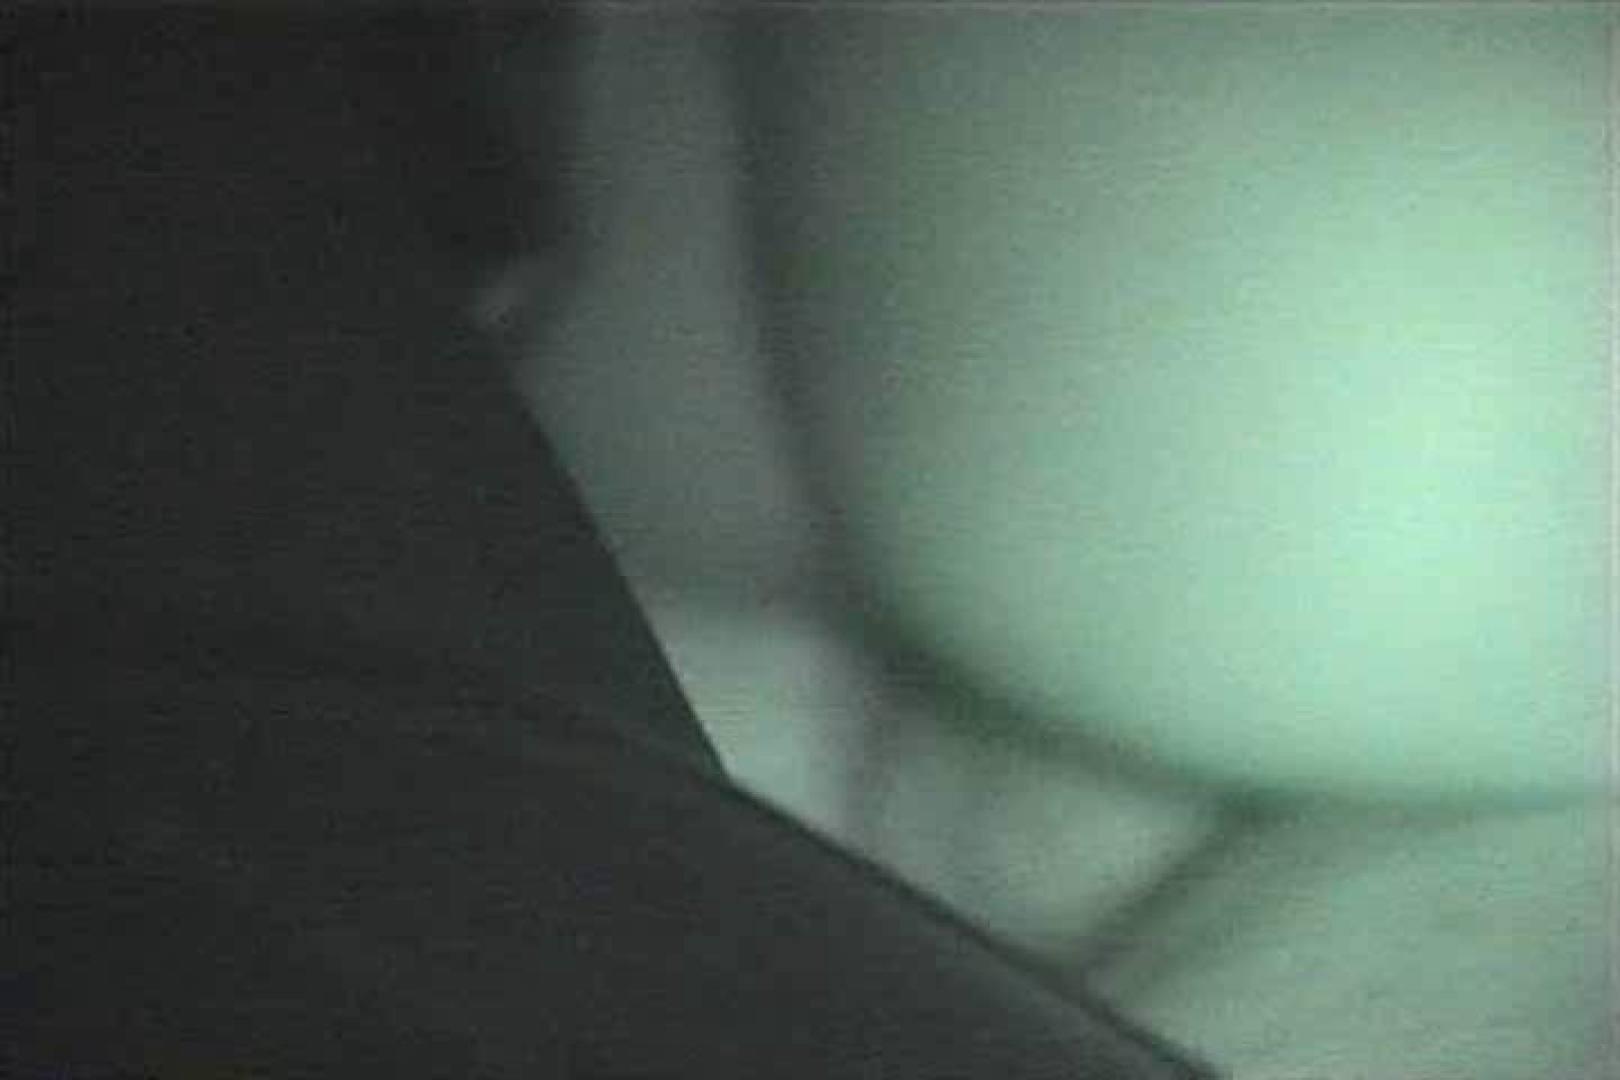 MASAさんの待ち伏せ撮り! 赤外線カーセックスVol.19 カップルのセックス | 赤外線  75PIX 36